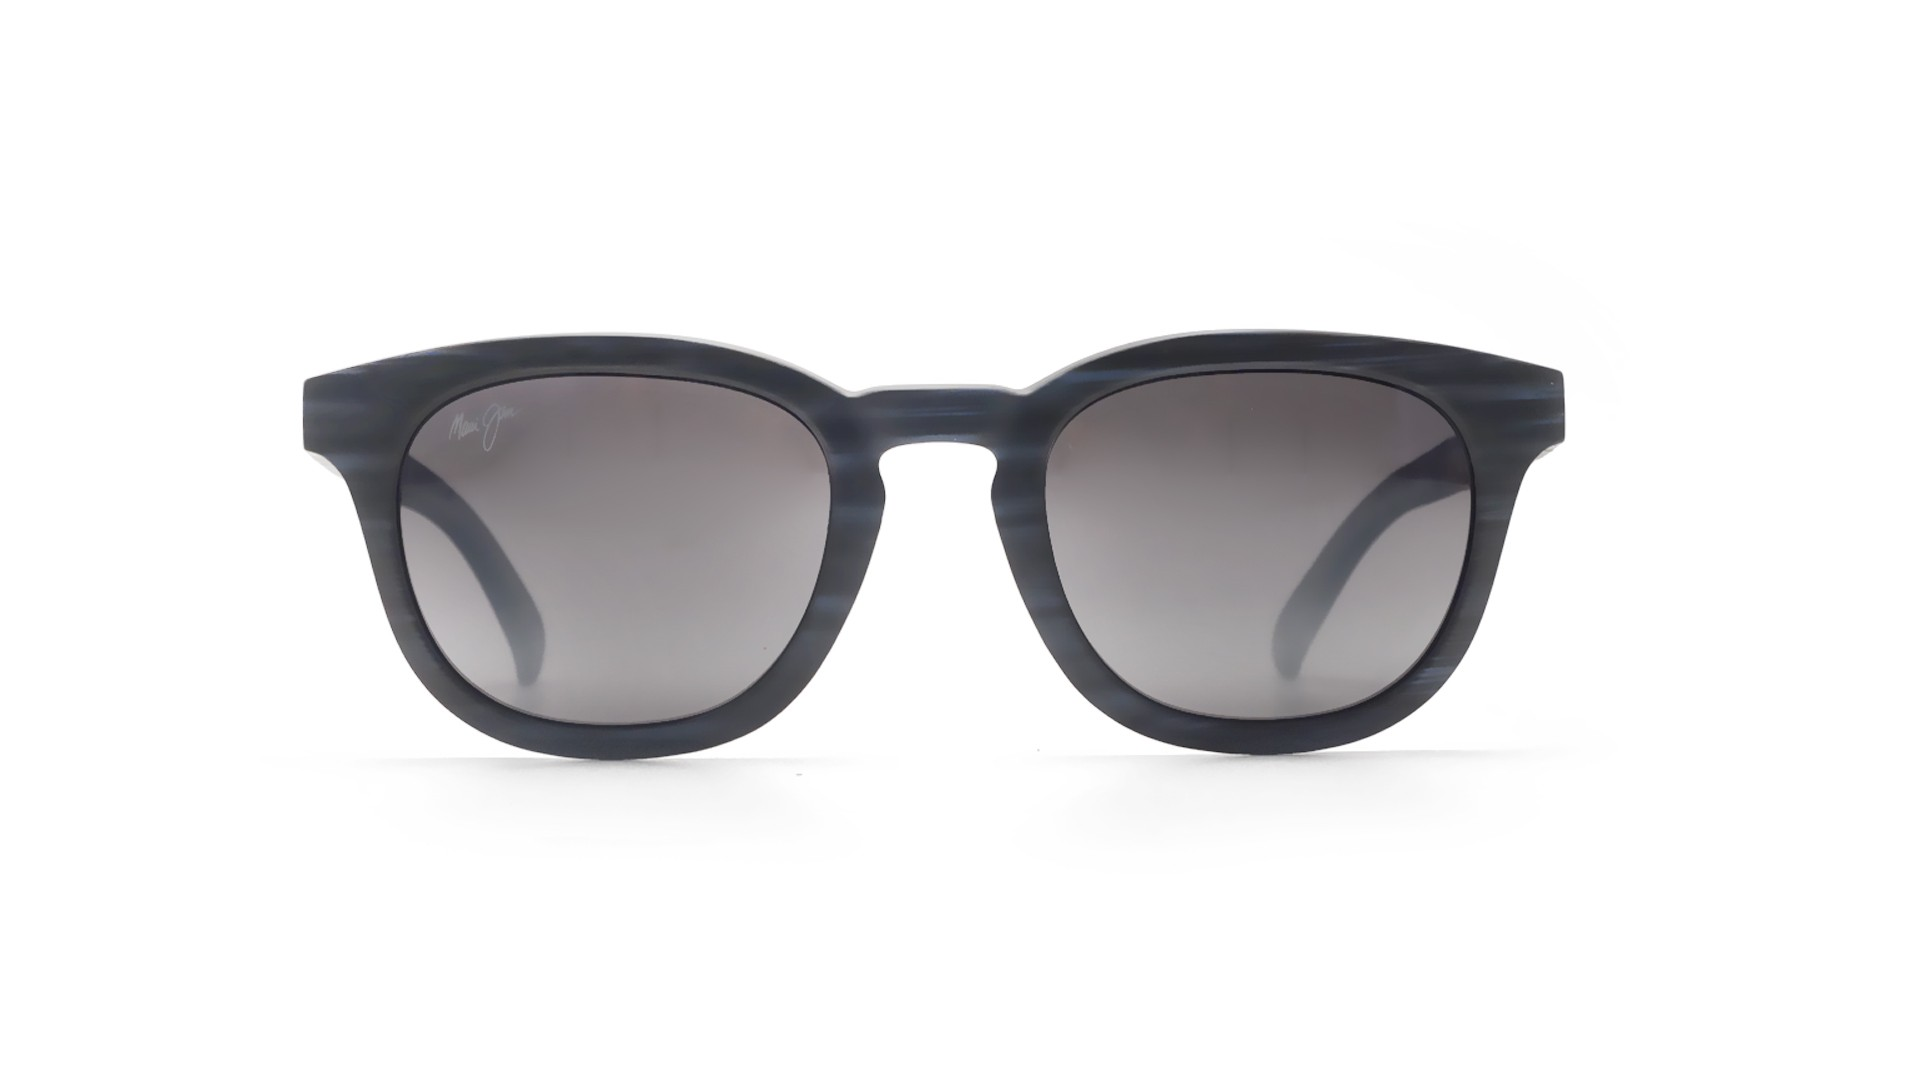 Sunglasses Maui Jim Koko head Woodgrain Grey Matte 737 63W 48-22 Medium  Polarized a47916a4a6bd